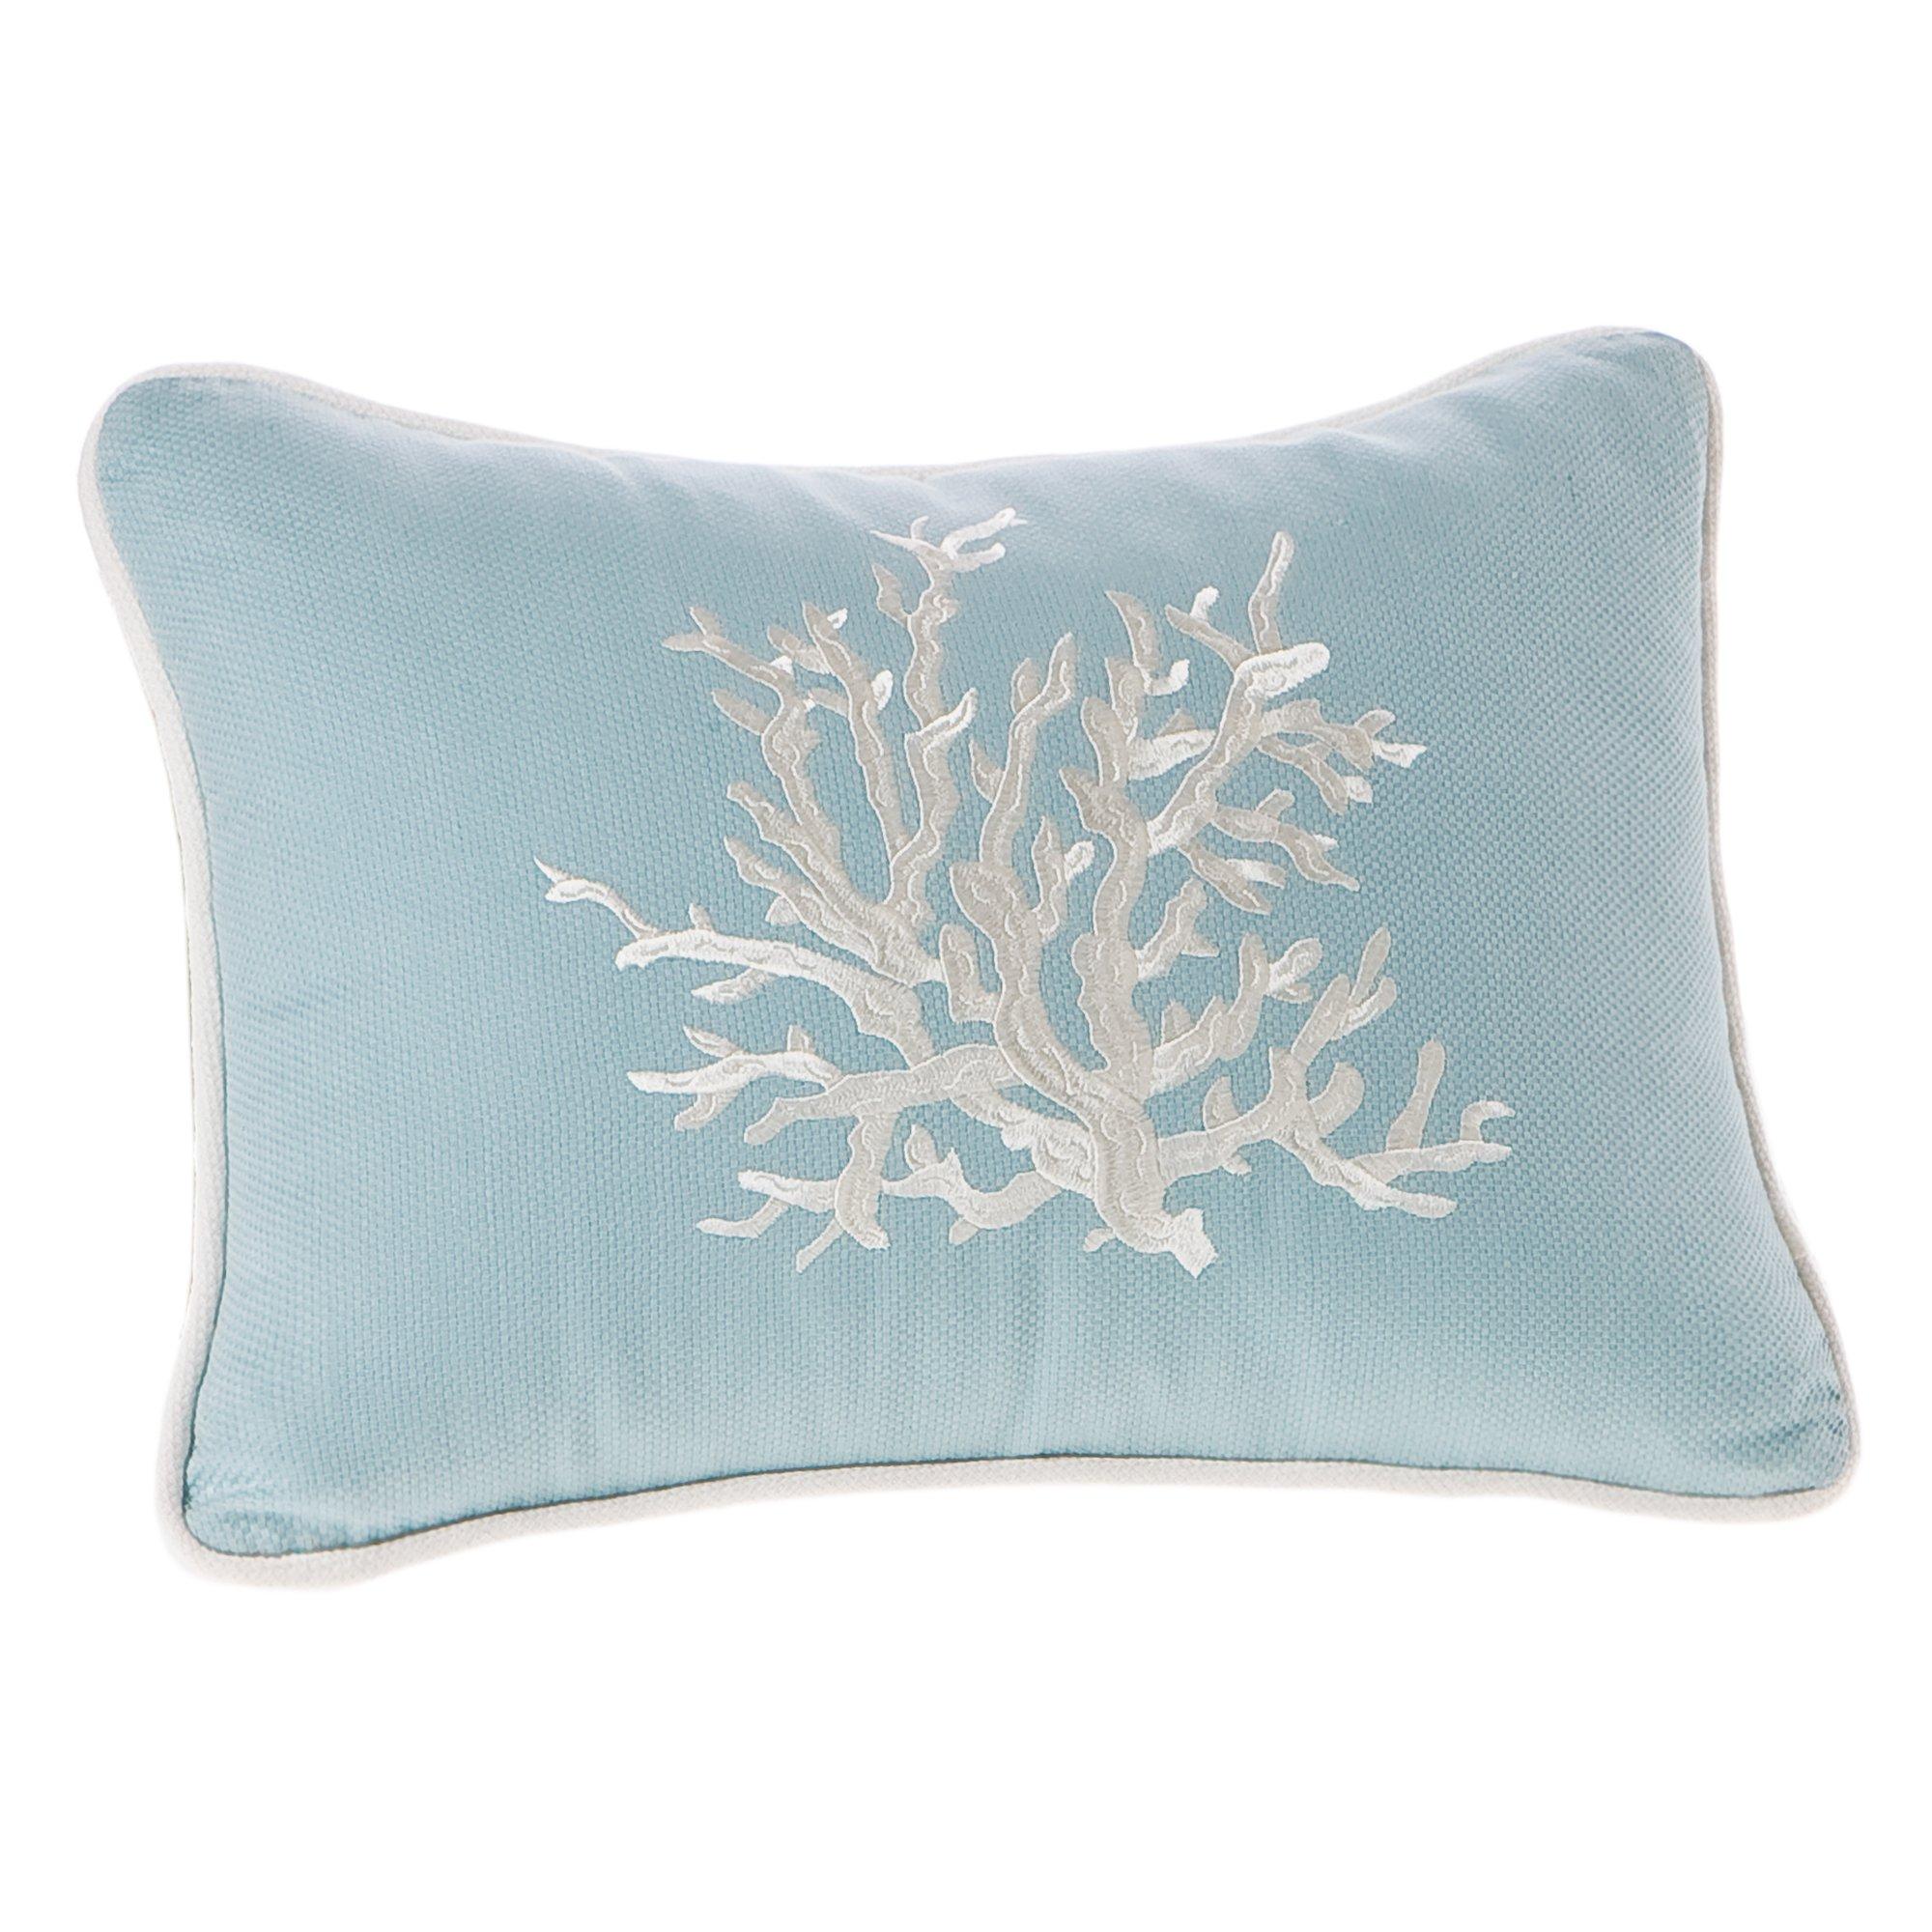 Harbor House Coastline Fashion Cotton Throw Pillow, acquard Oblong Decorative Pillow, 12X16, Blue by Harbor House